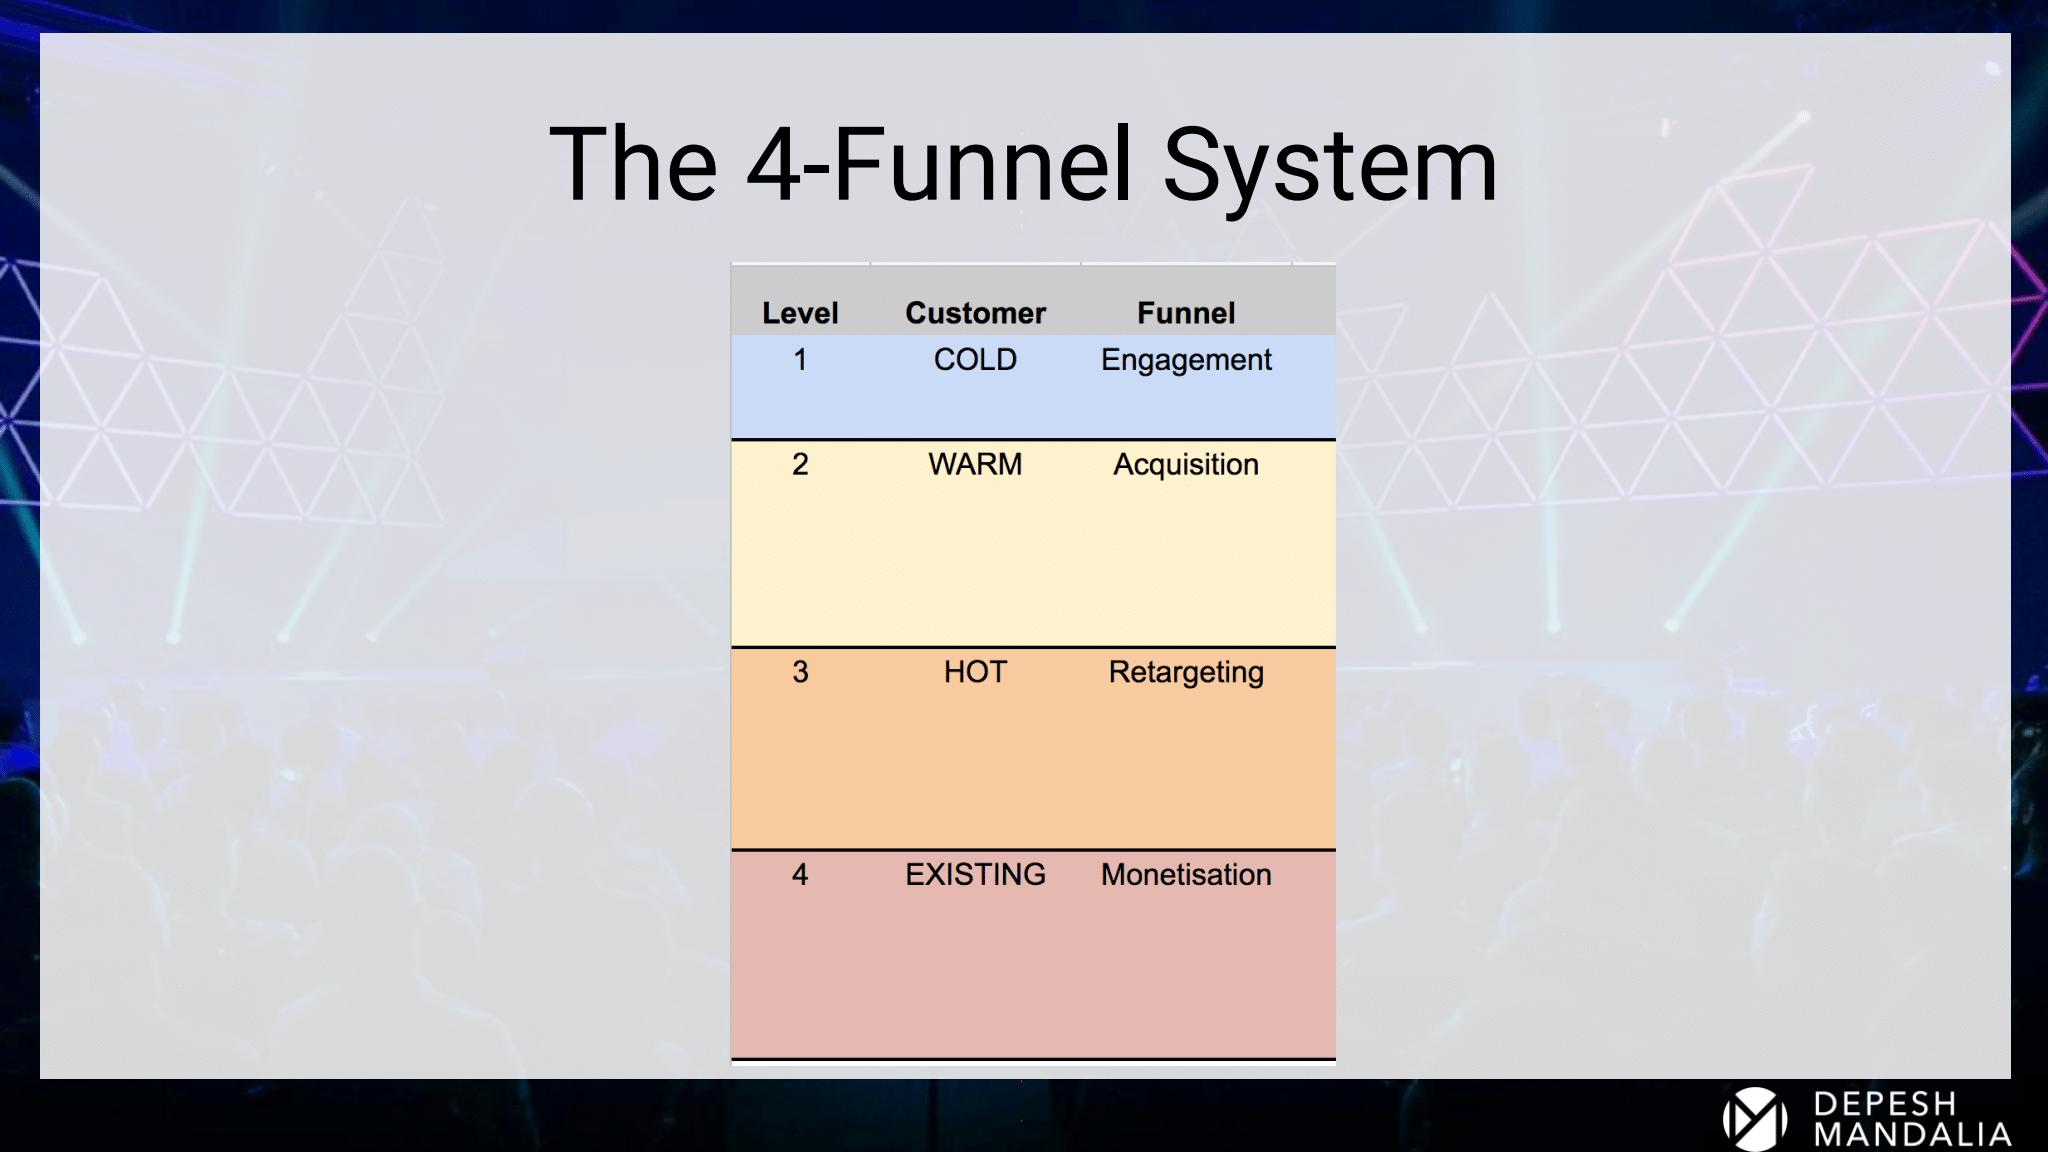 Depesh Mandalia – The 4-Funnel System